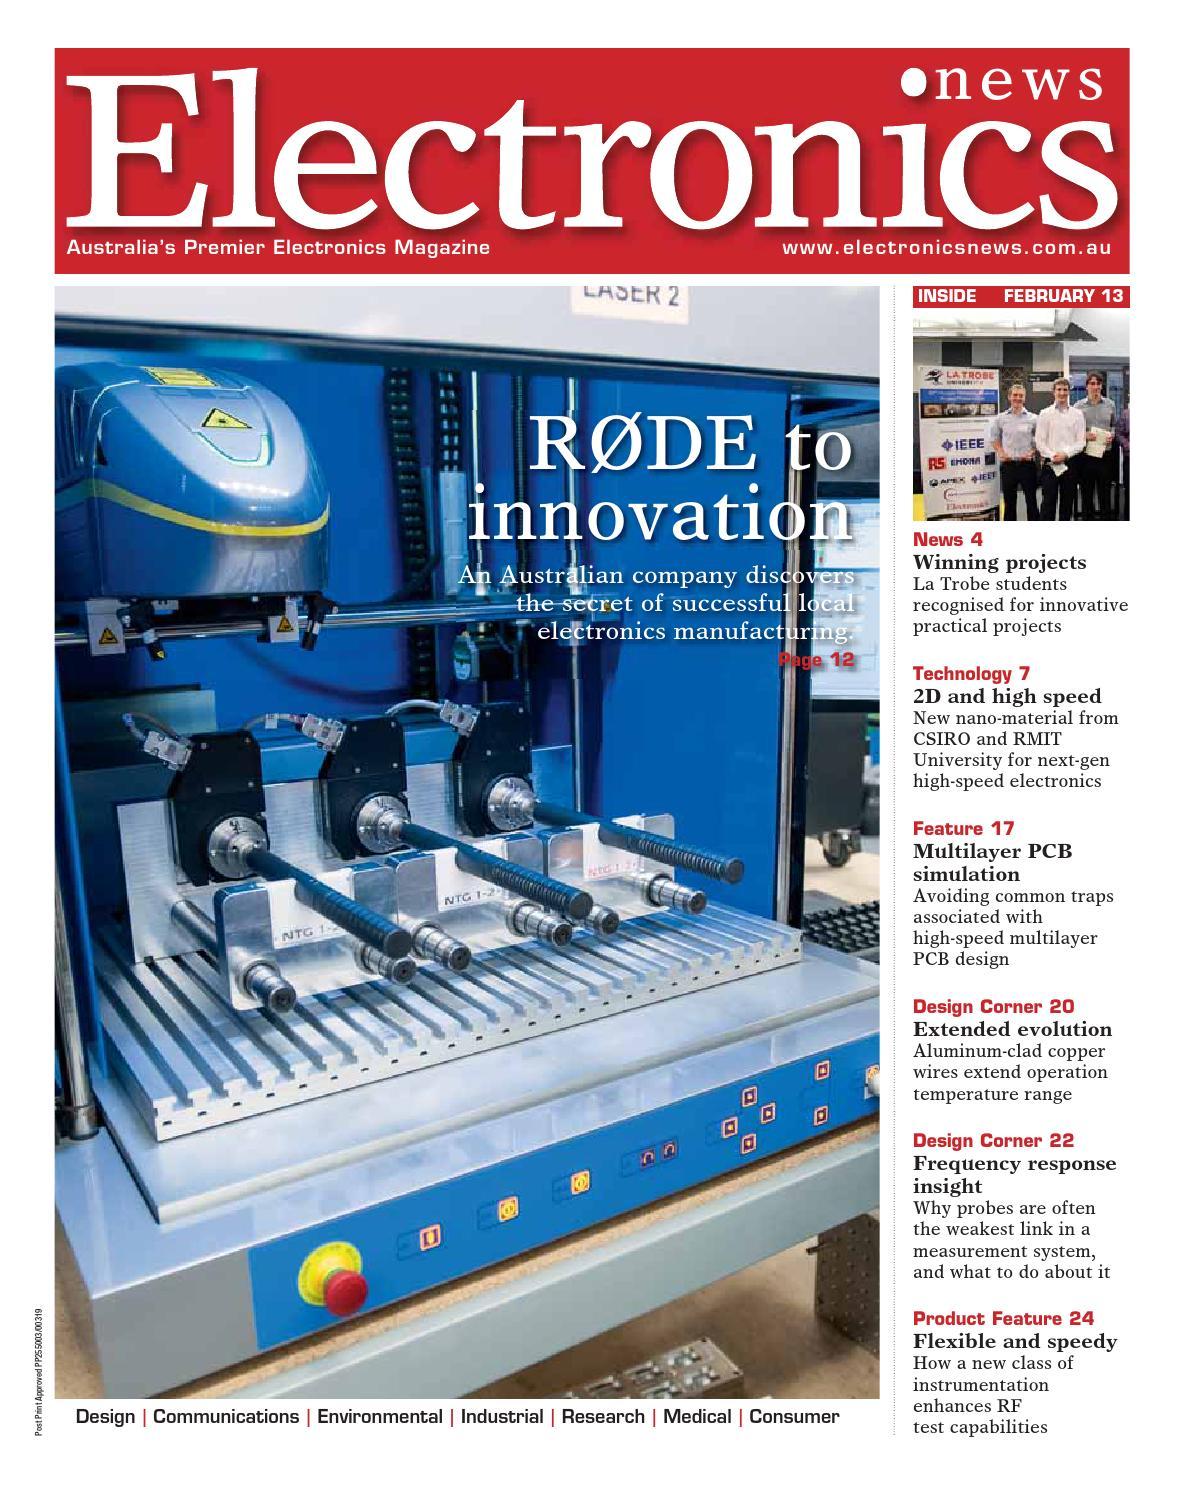 Electronics News February 2013 by PrimeCreative - issuu